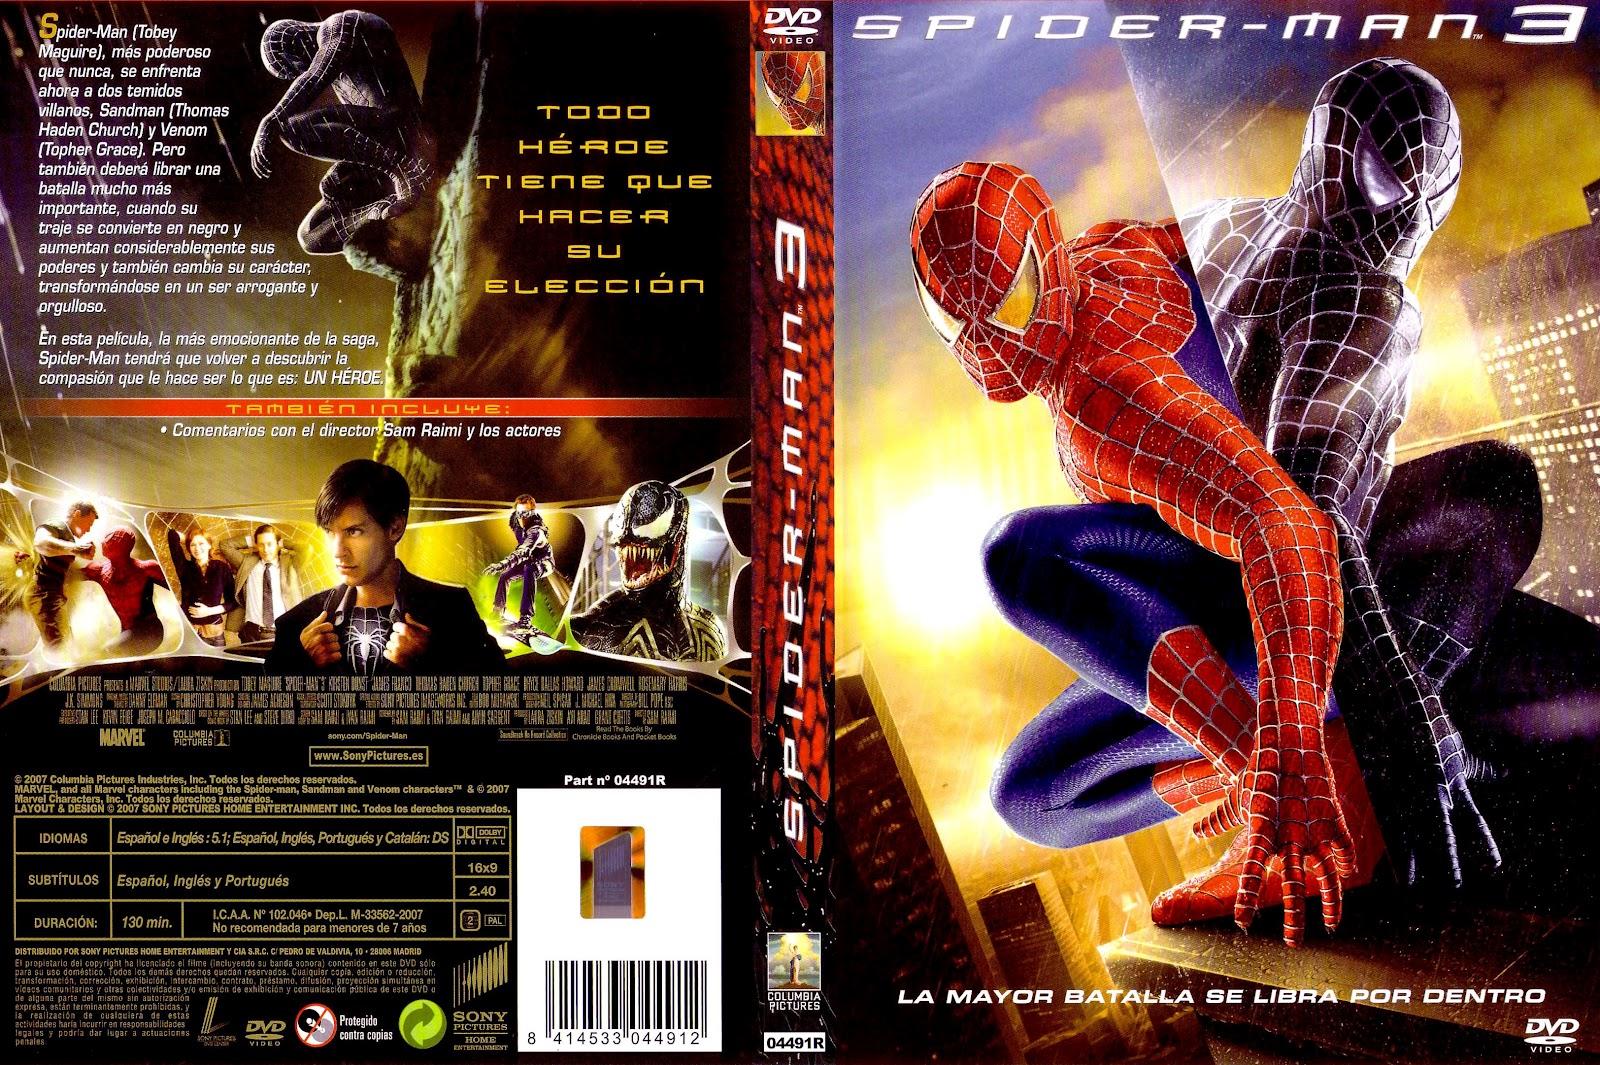 http://2.bp.blogspot.com/-9rFiVl8dRVA/UDzWgS3MvLI/AAAAAAAAGHs/scXd8XXGHq4/s1600/Spider-Man+3.jpg